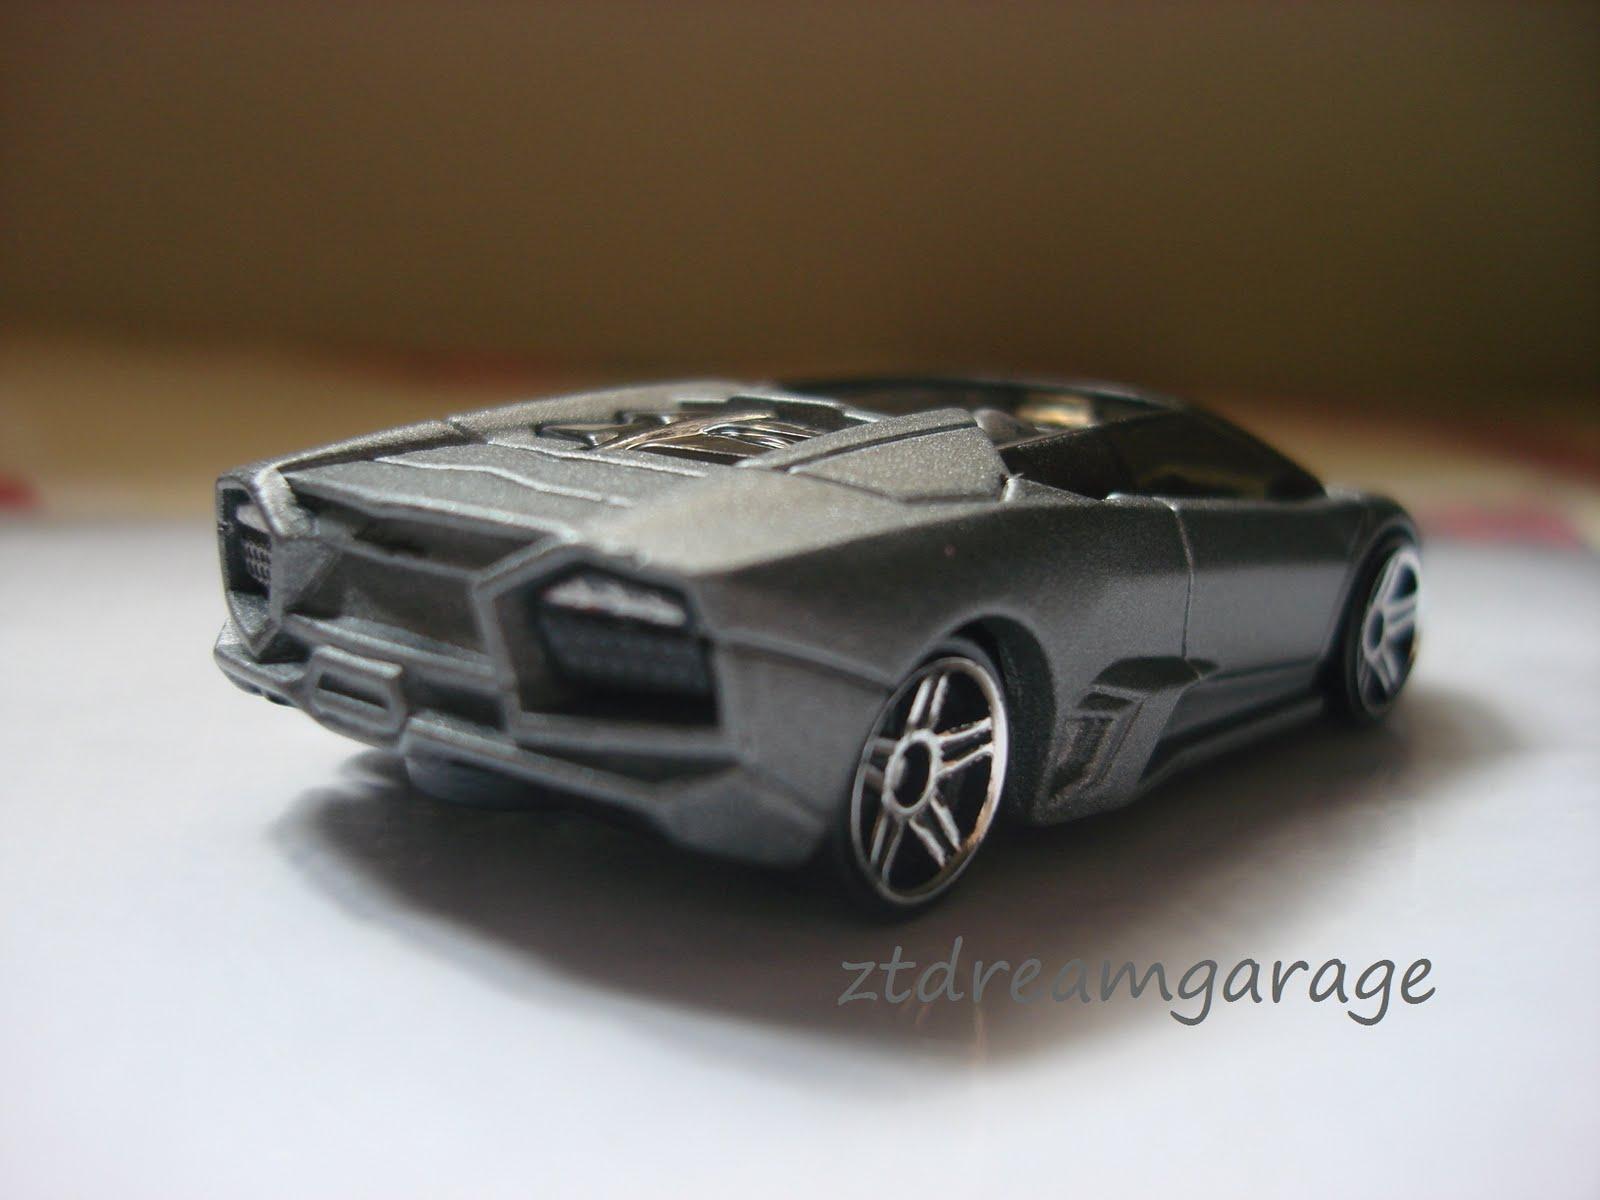 lamborghini-hot-wheels-17-car-desktop-background Surprising Lamborghini Gallardo Hot Wheels Wiki Cars Trend